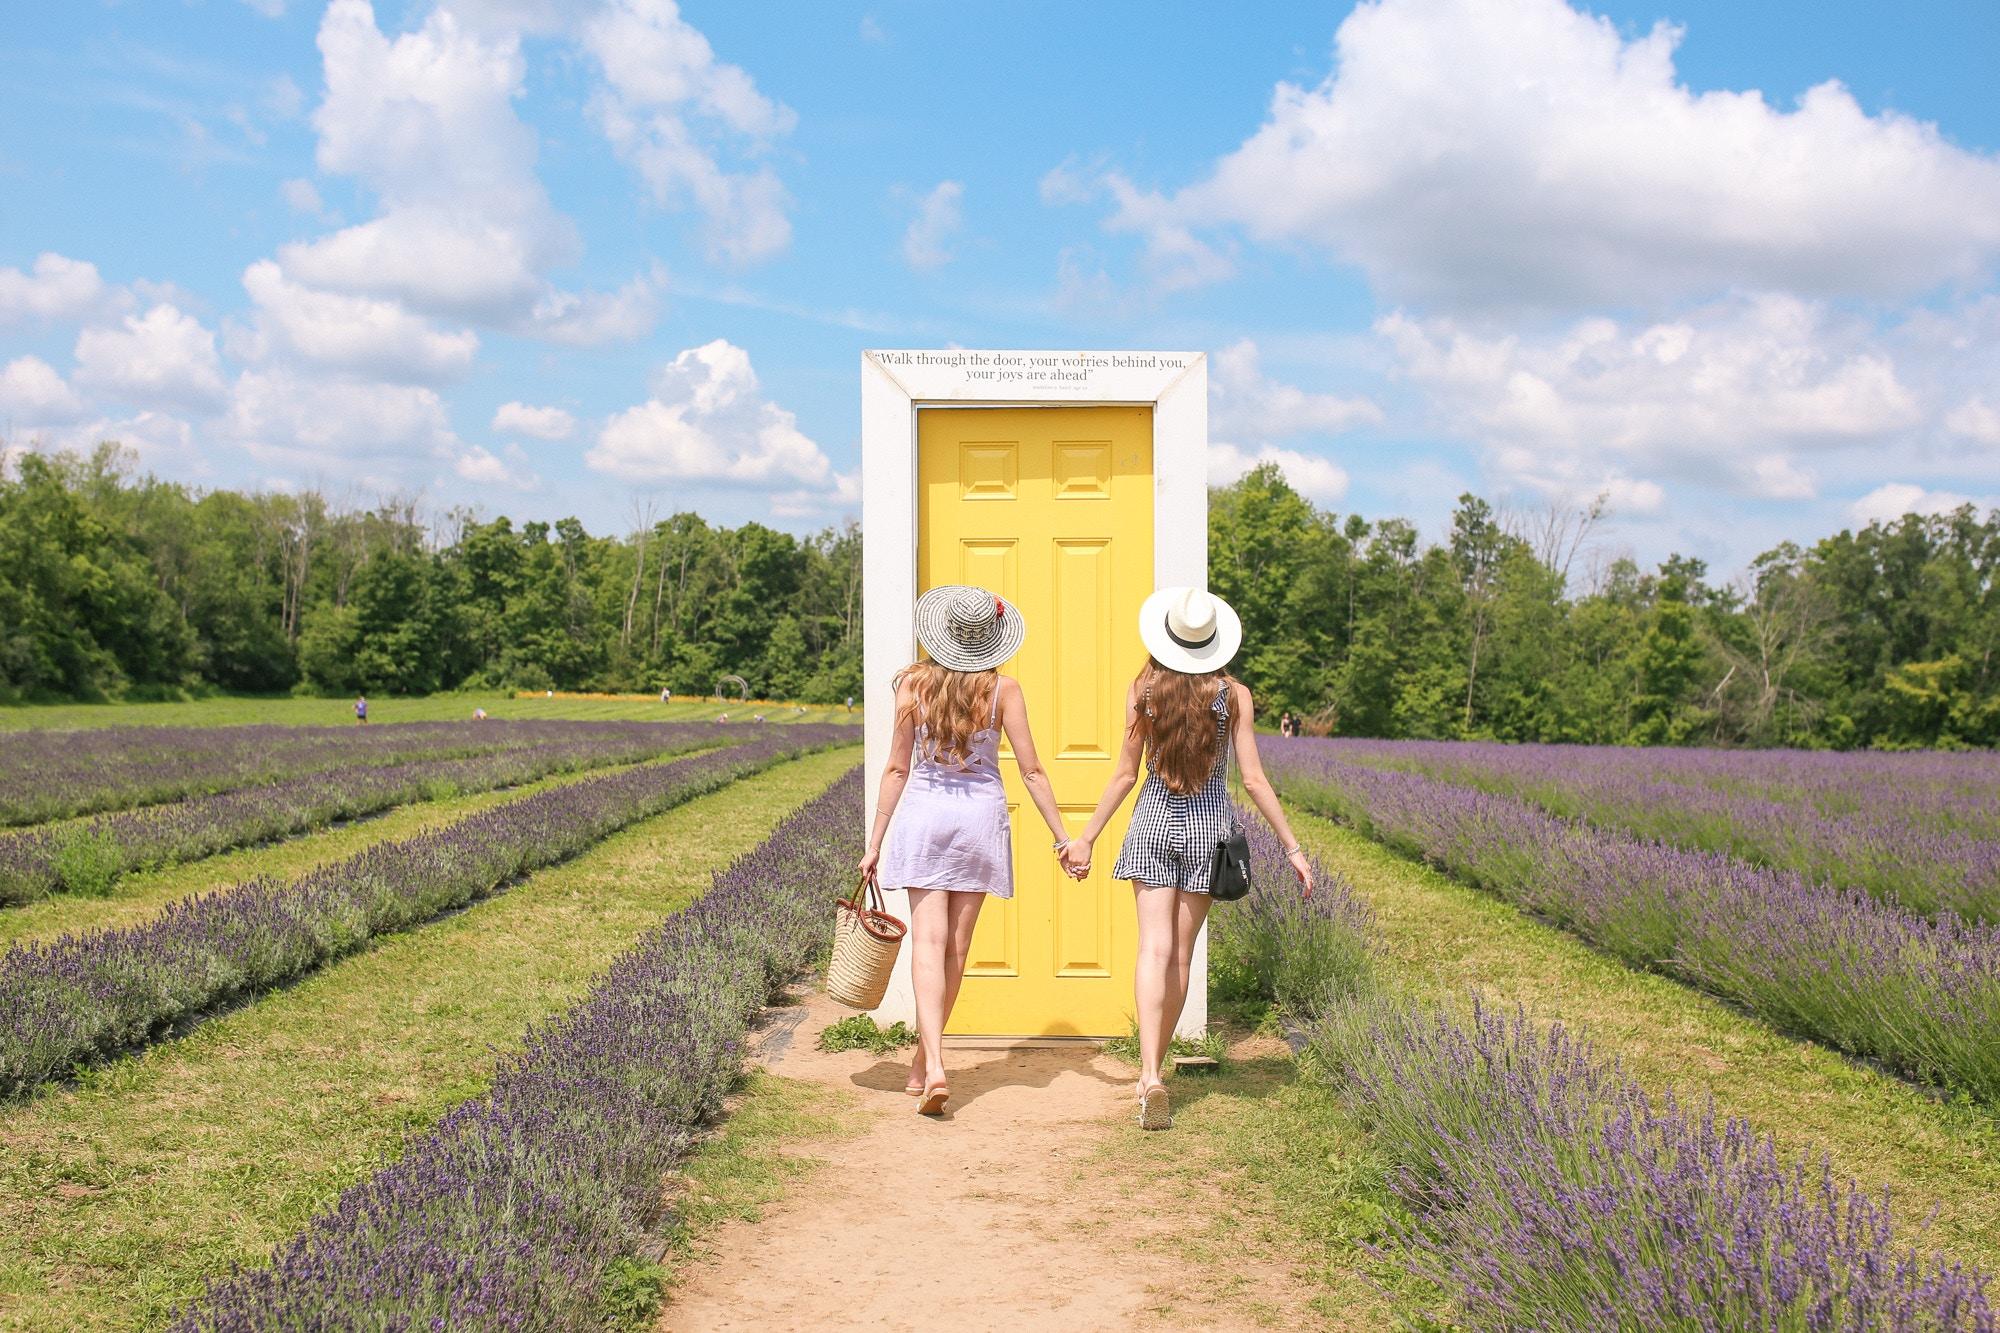 Natalie and Sasha Ast, sister bloggers from Toronto visit to Terre Bleu Lavender Farm